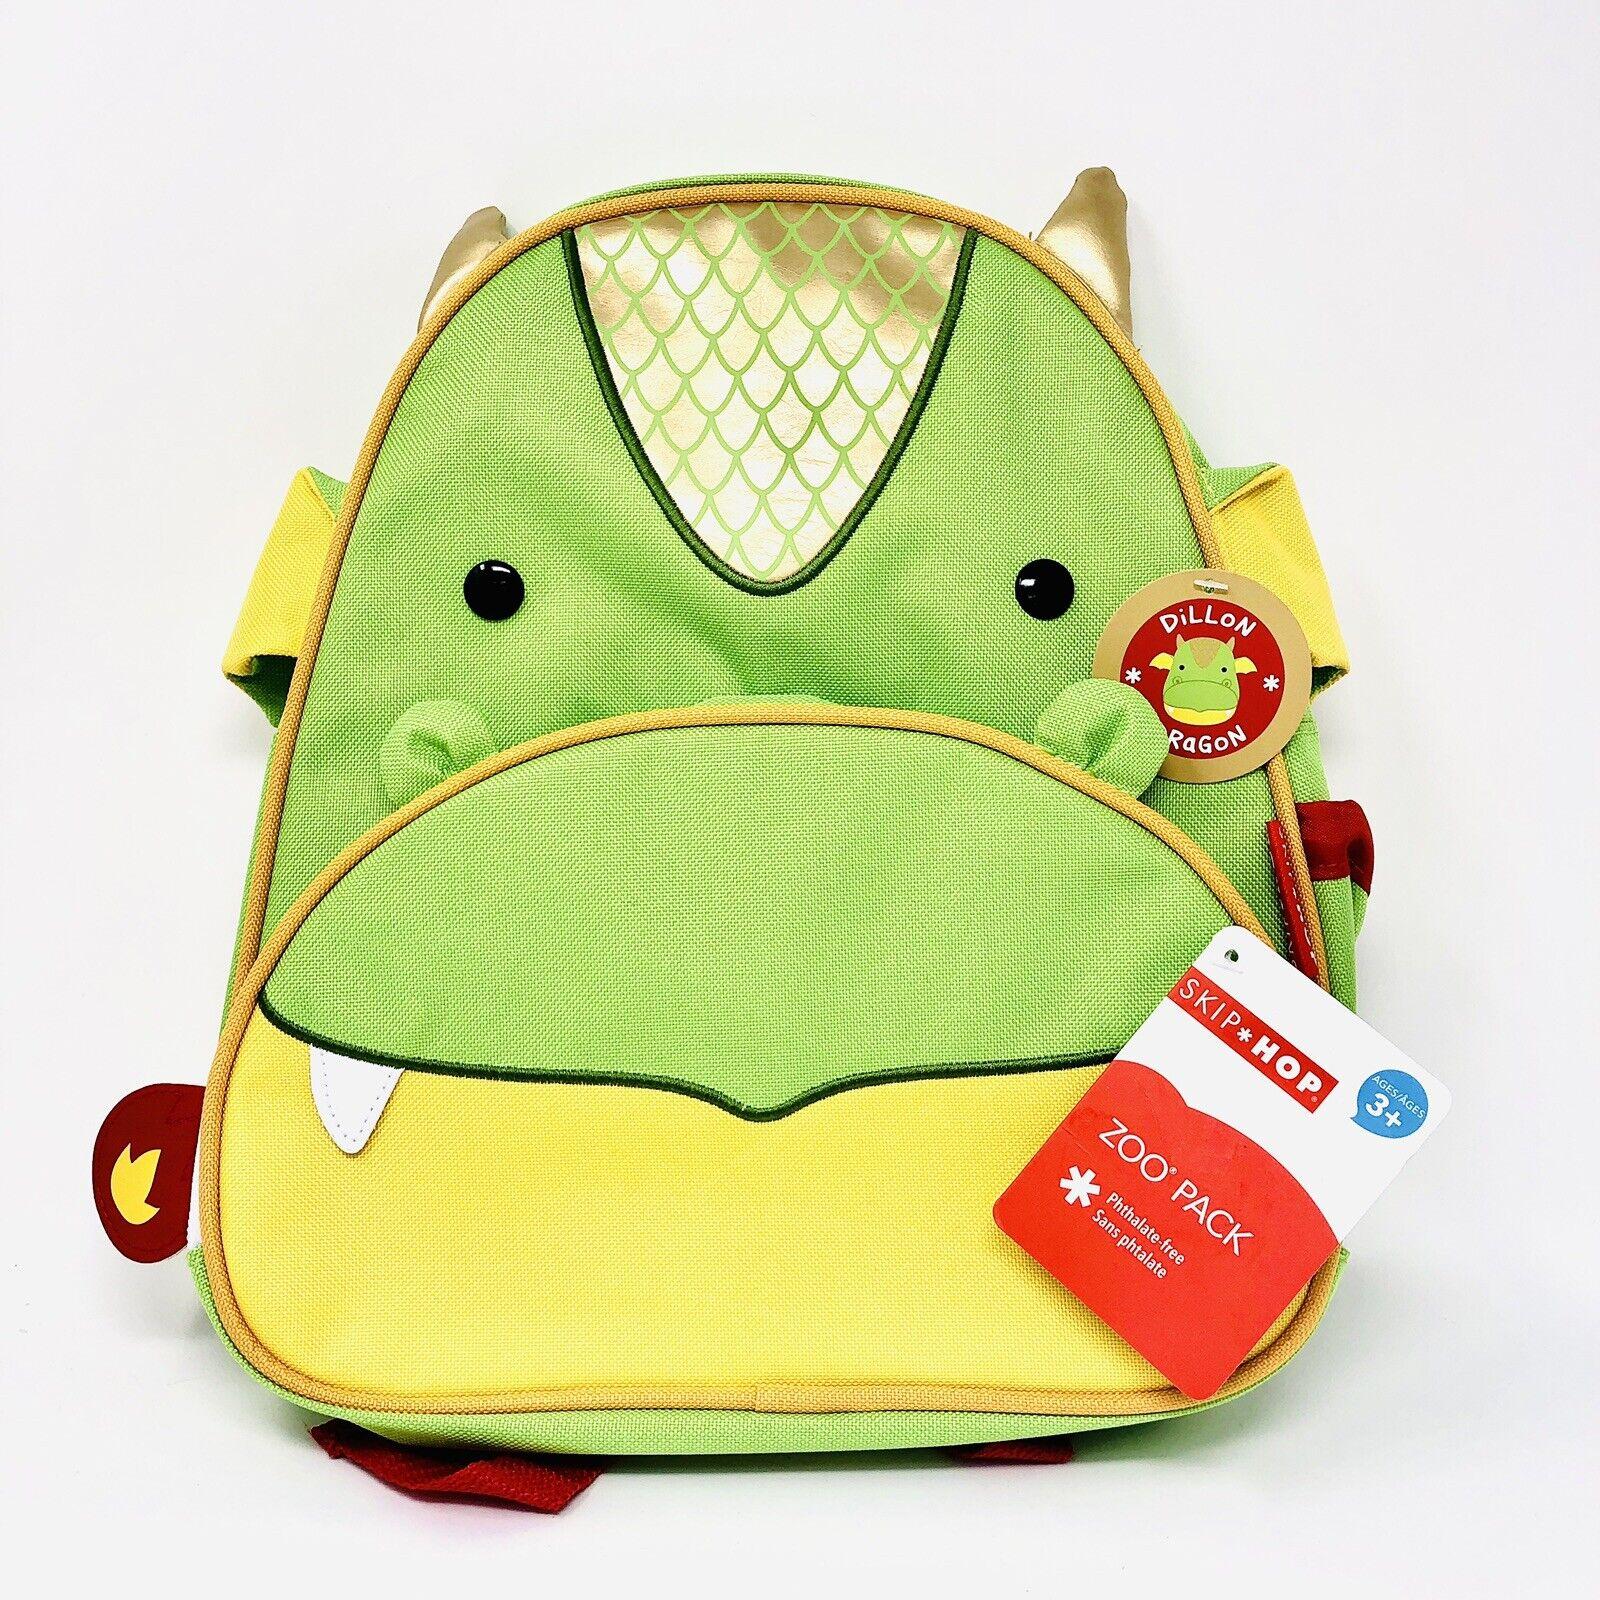 Skip Hop Zoo Pack Dillon Dragon Backpack Book Bag Pre-K Toddler 3+ Green Yellow